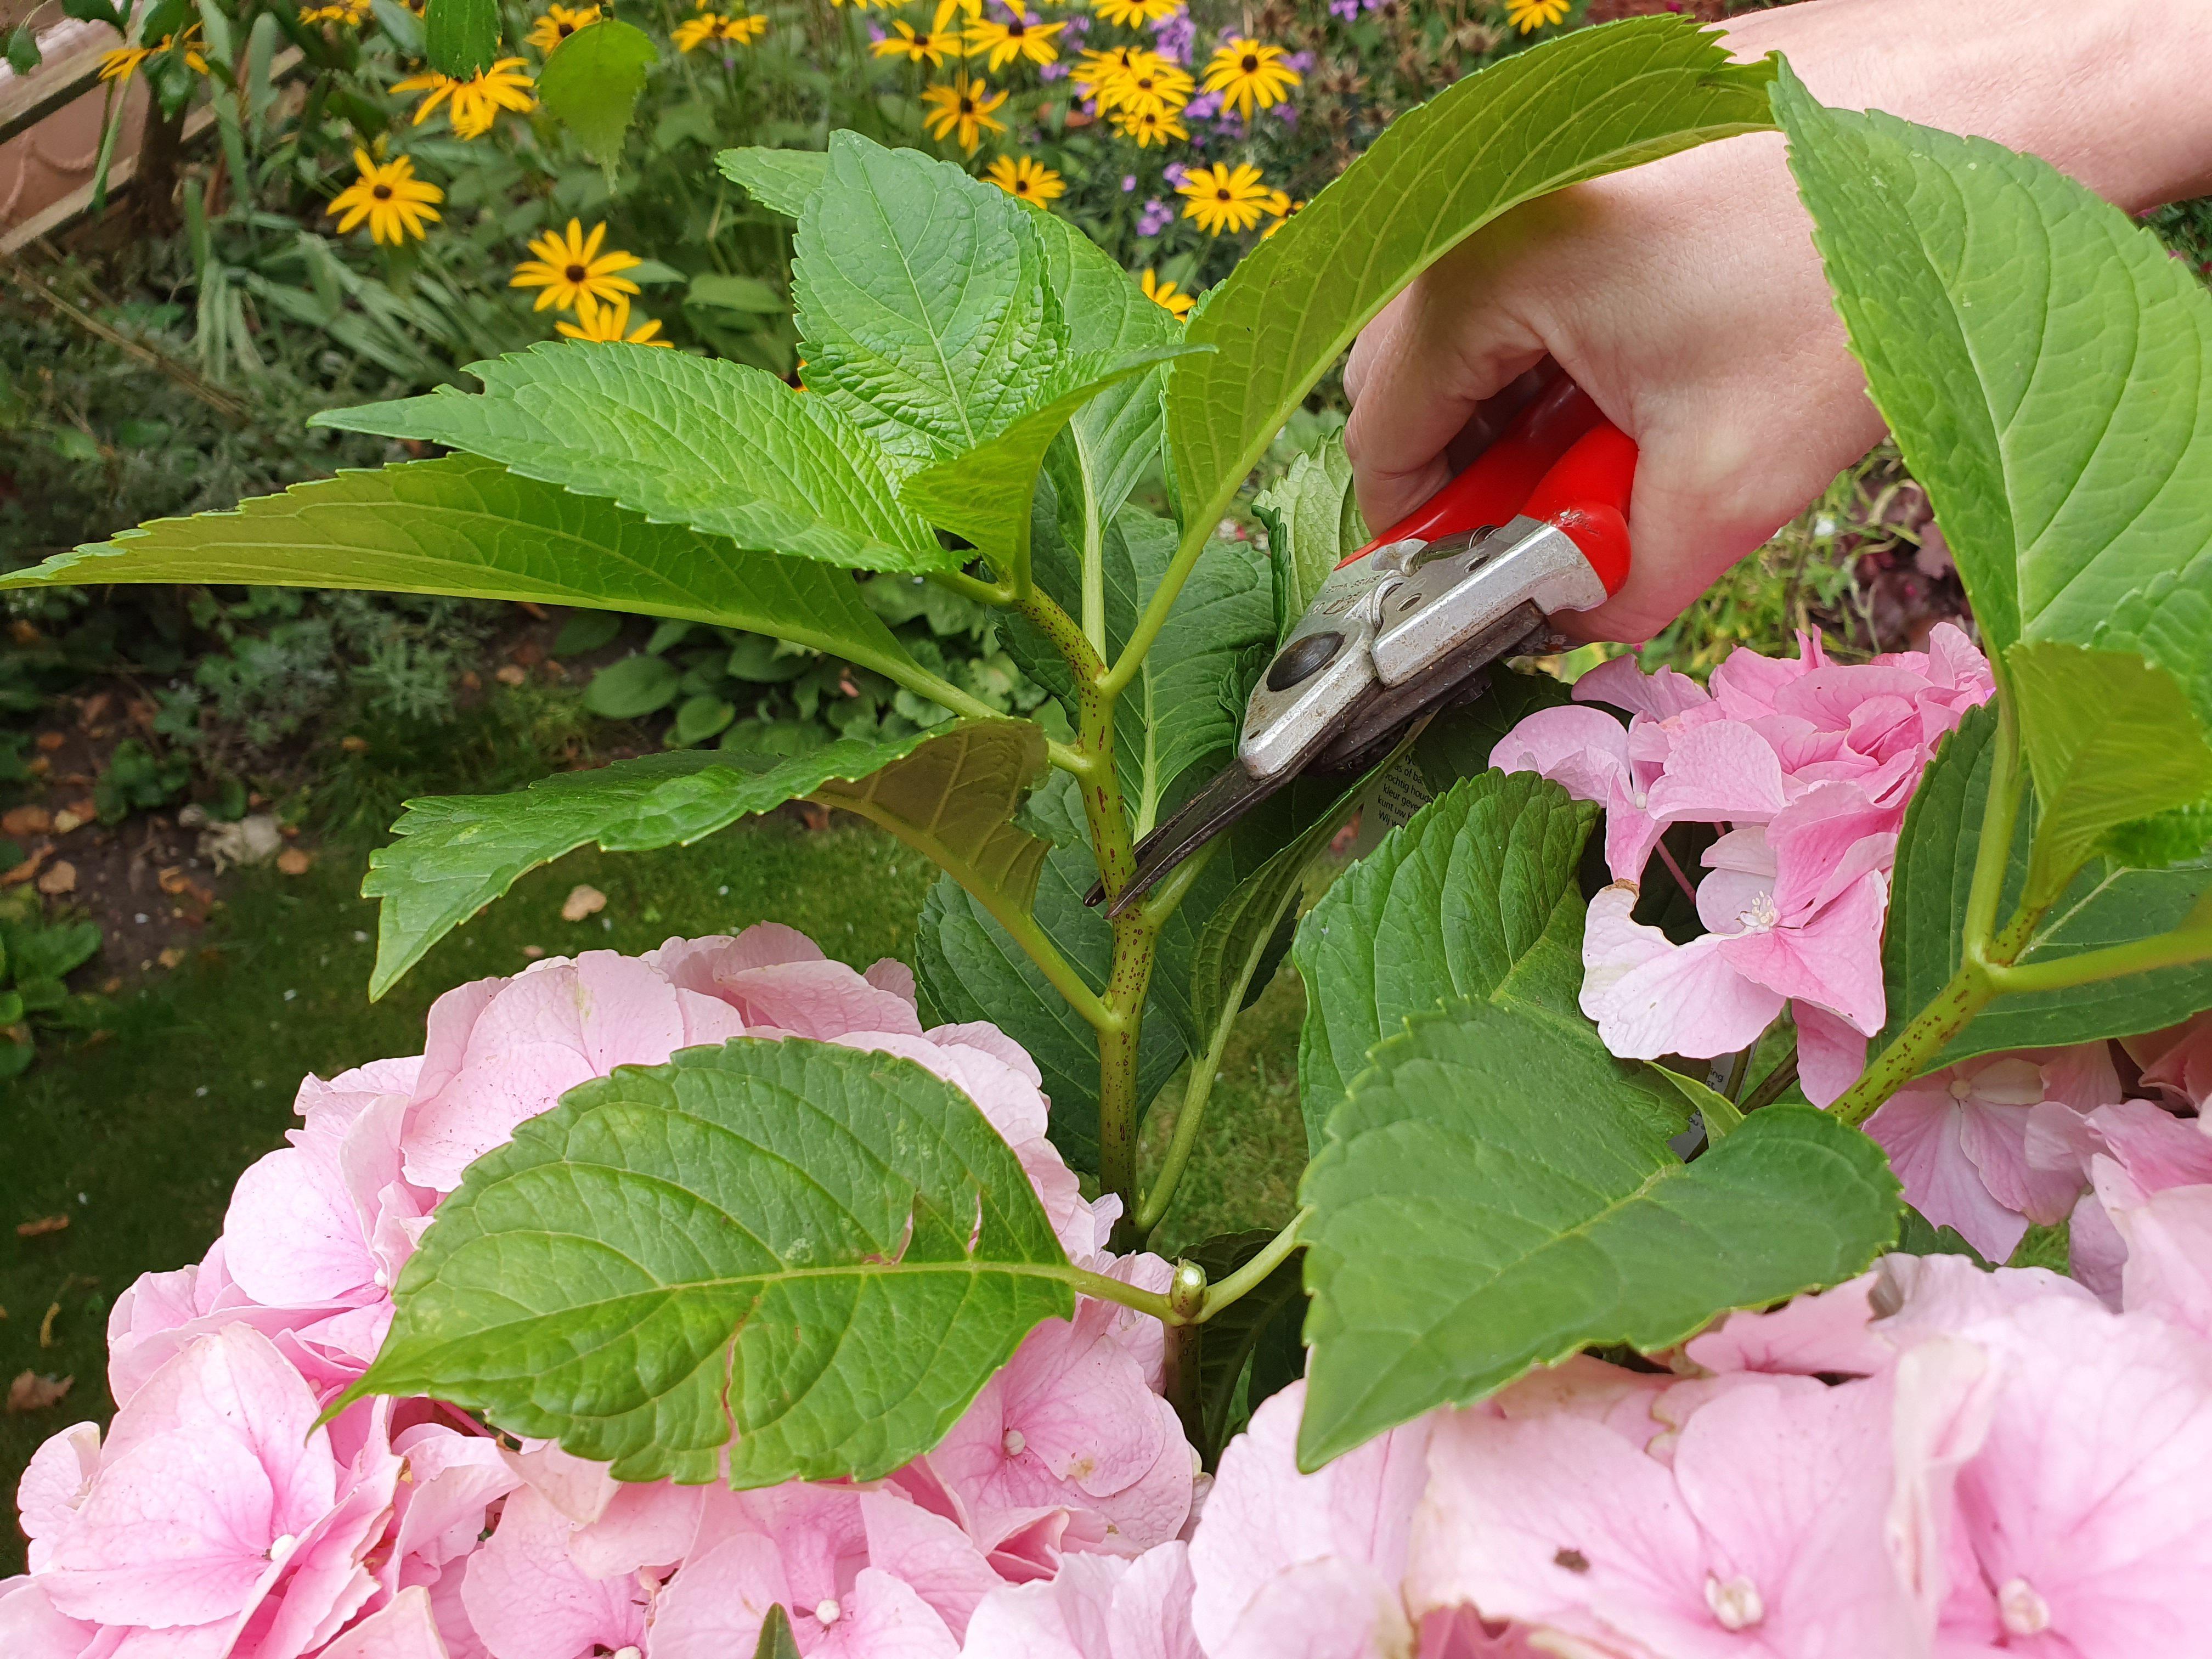 Use secateurs to cut above a hydrangea leaf node